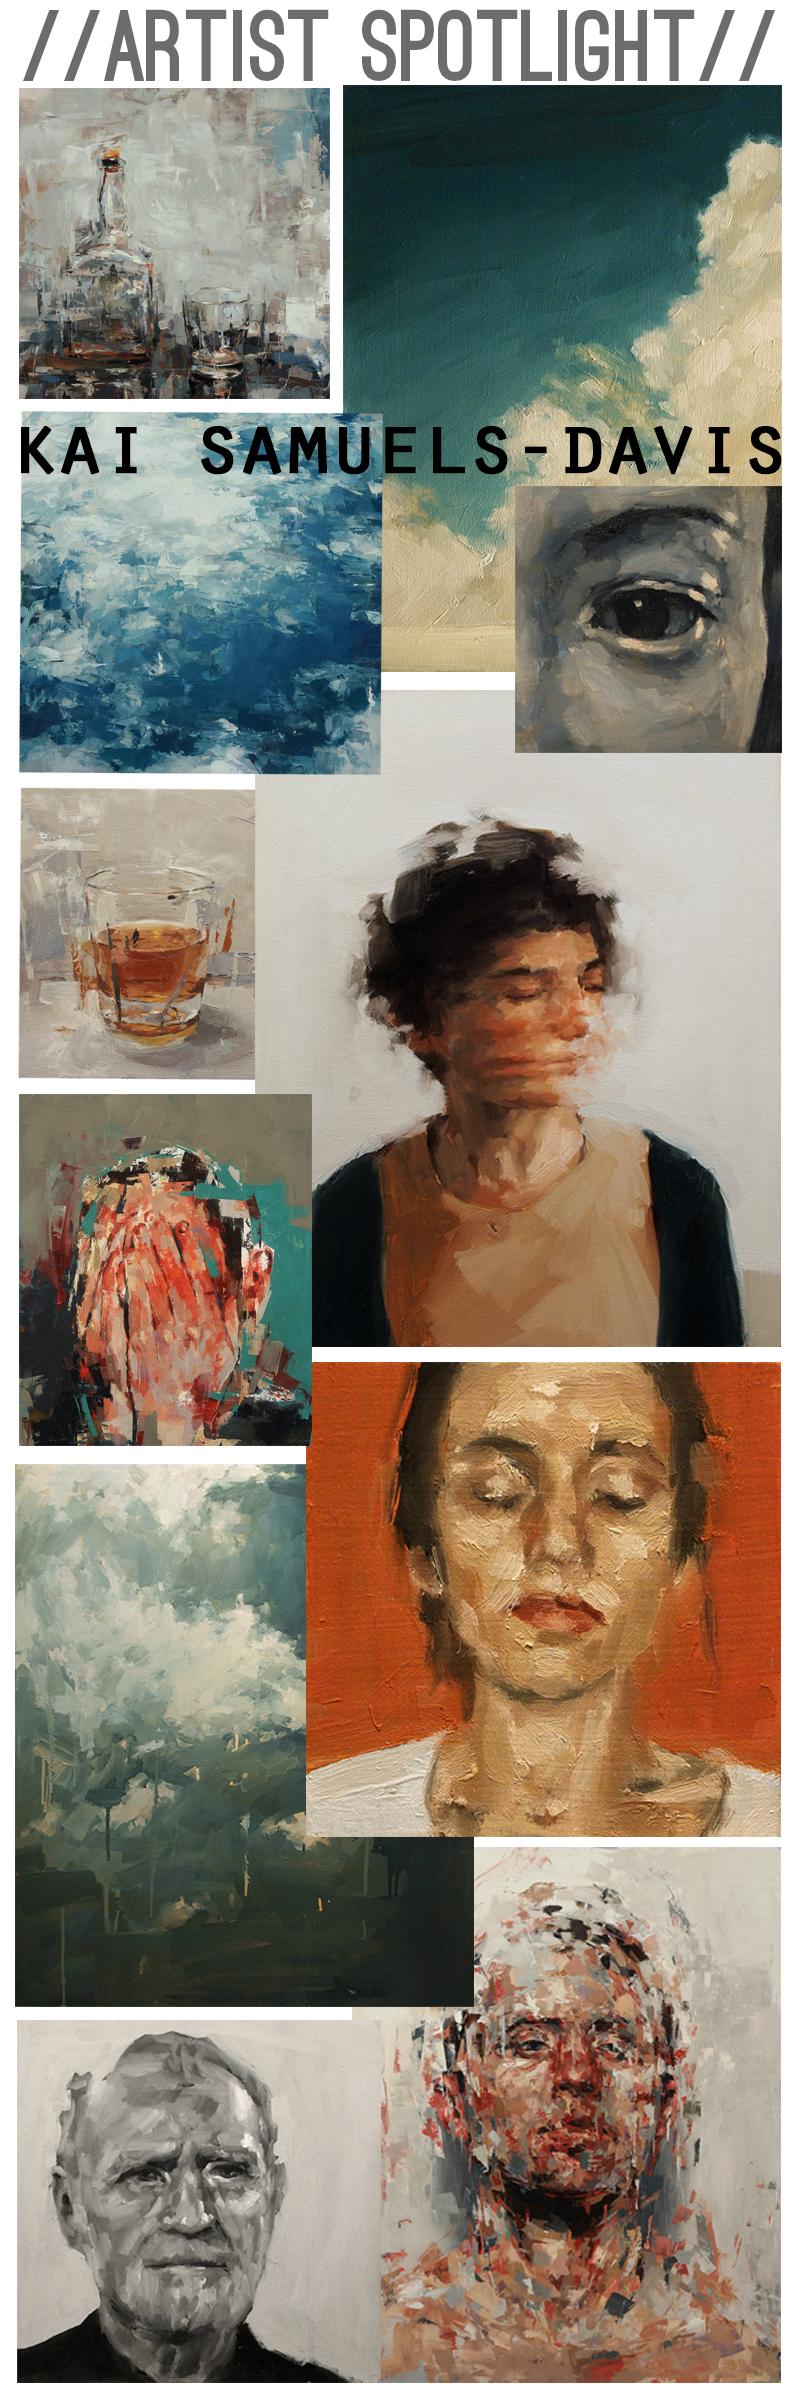 Artist Kai Samuels-Davis